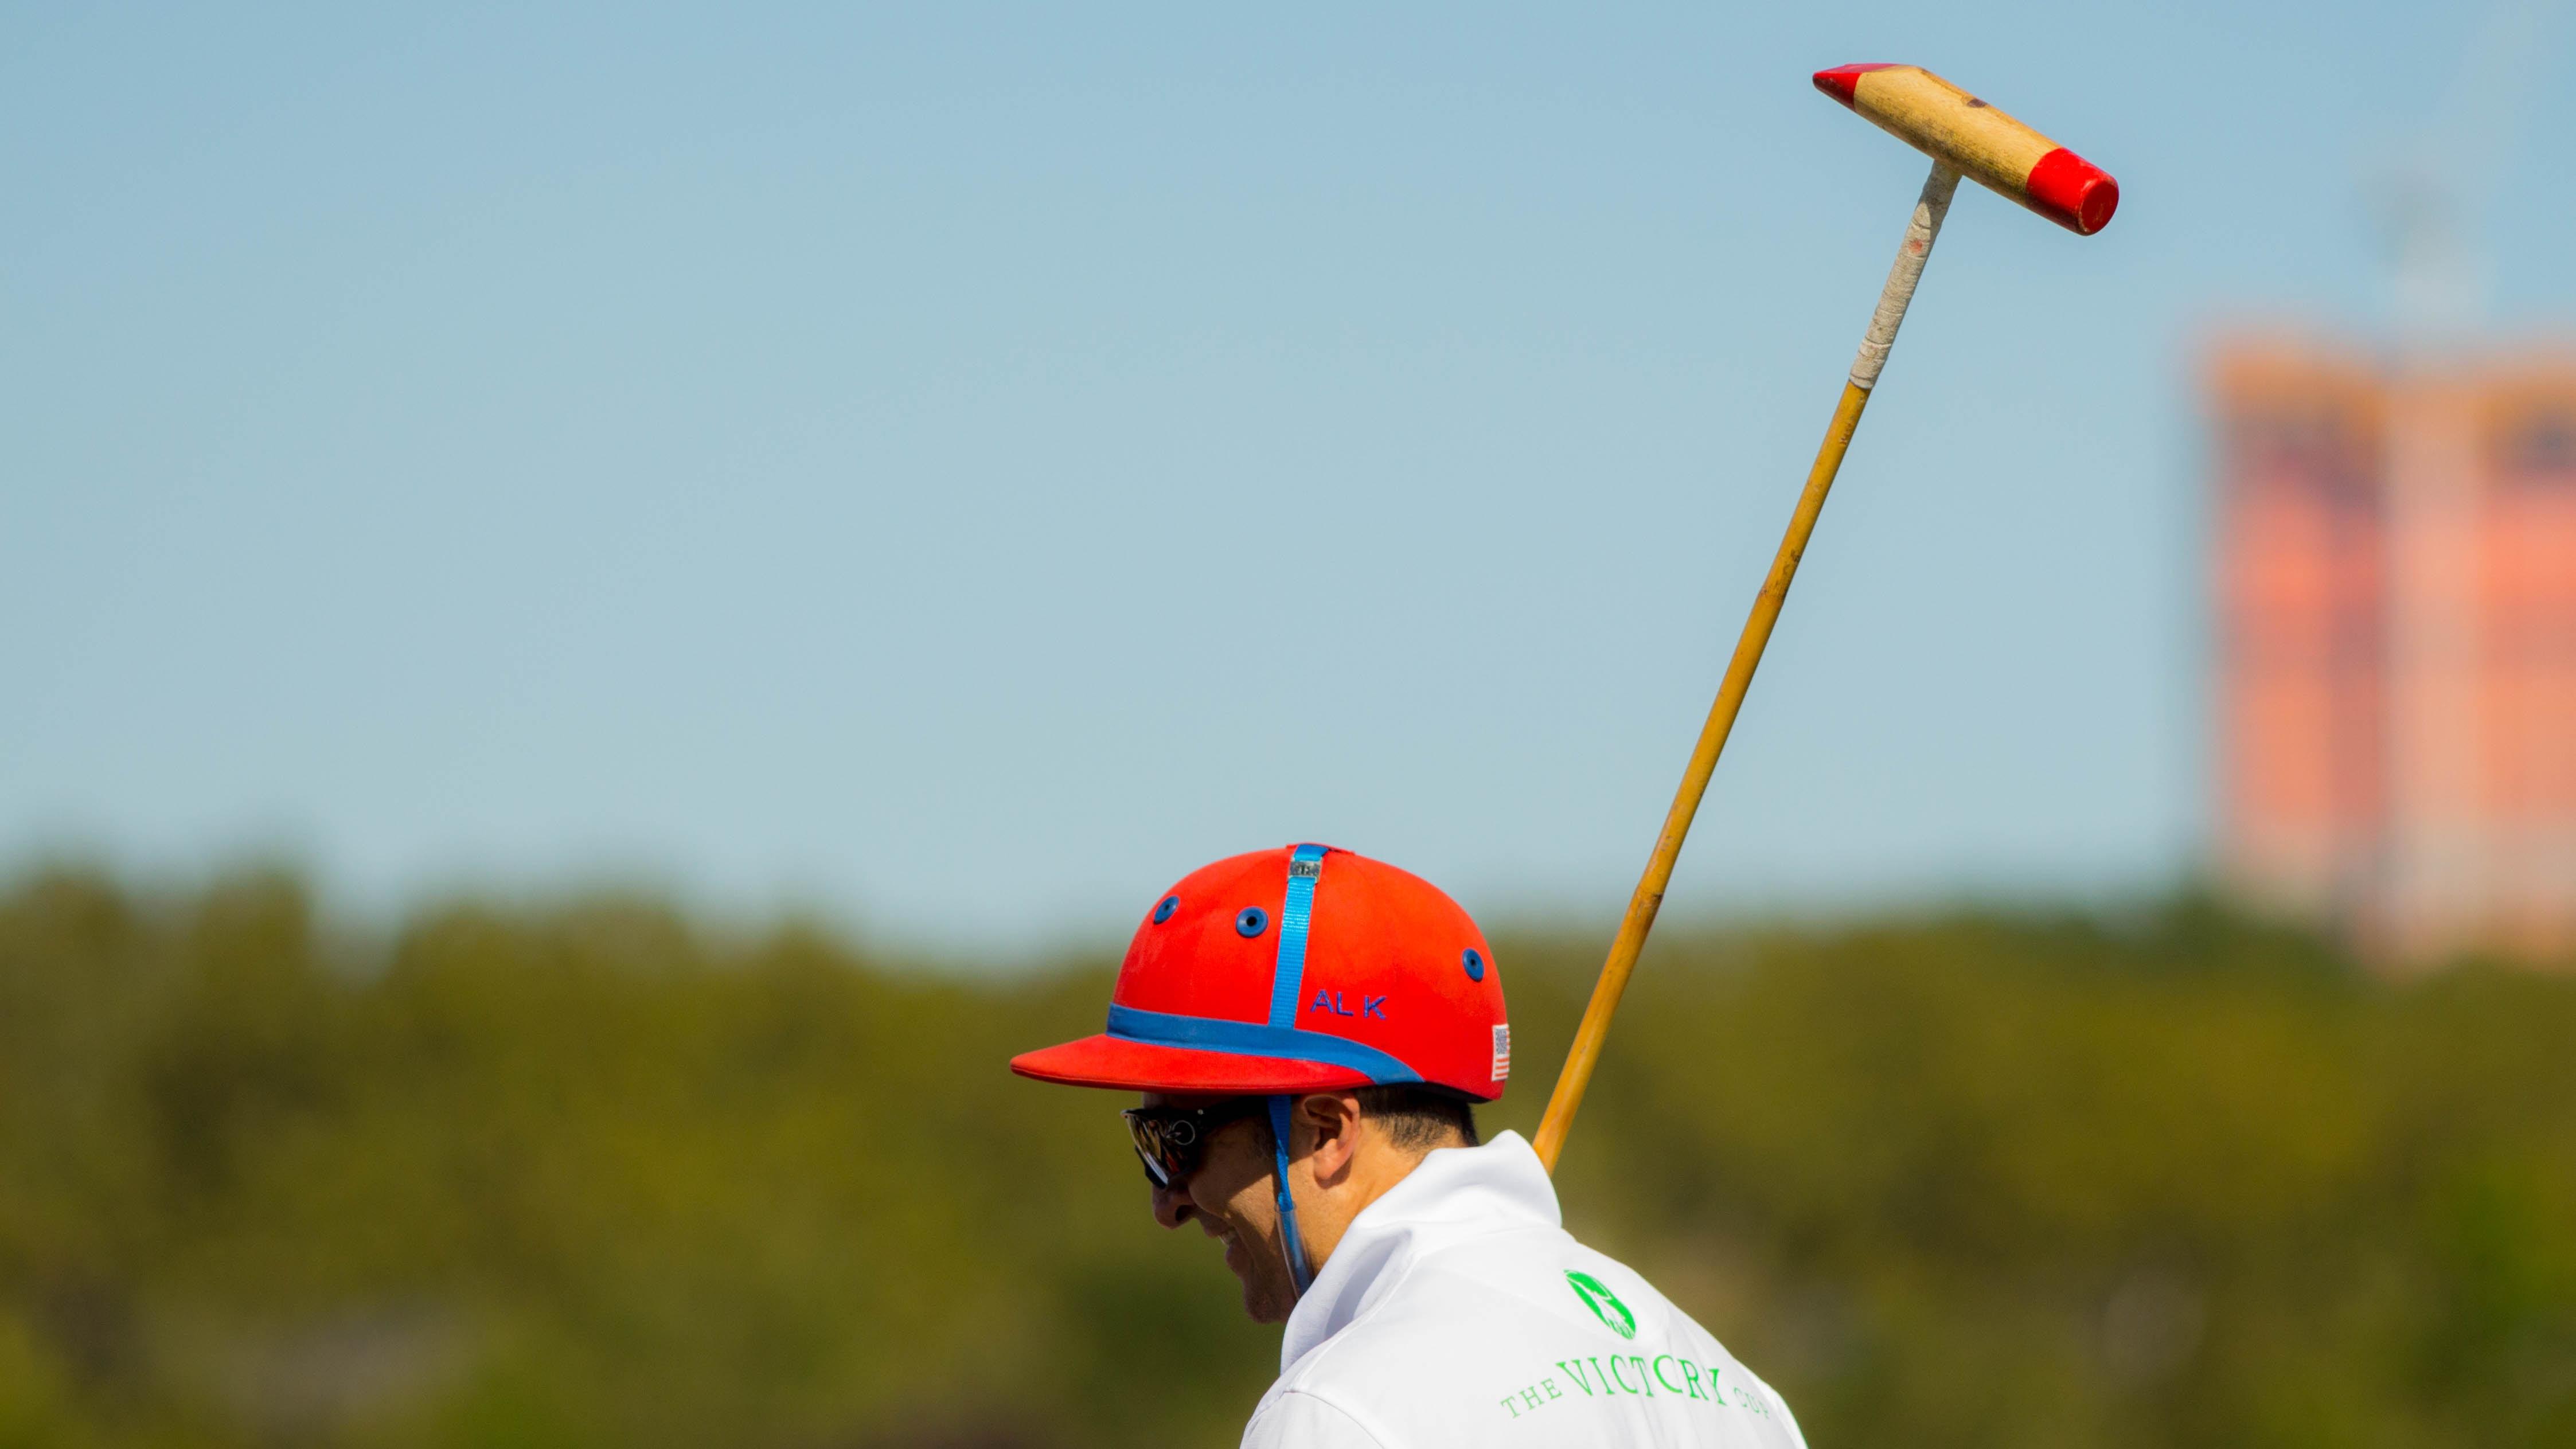 man holding brown wooden stick during daytime photo